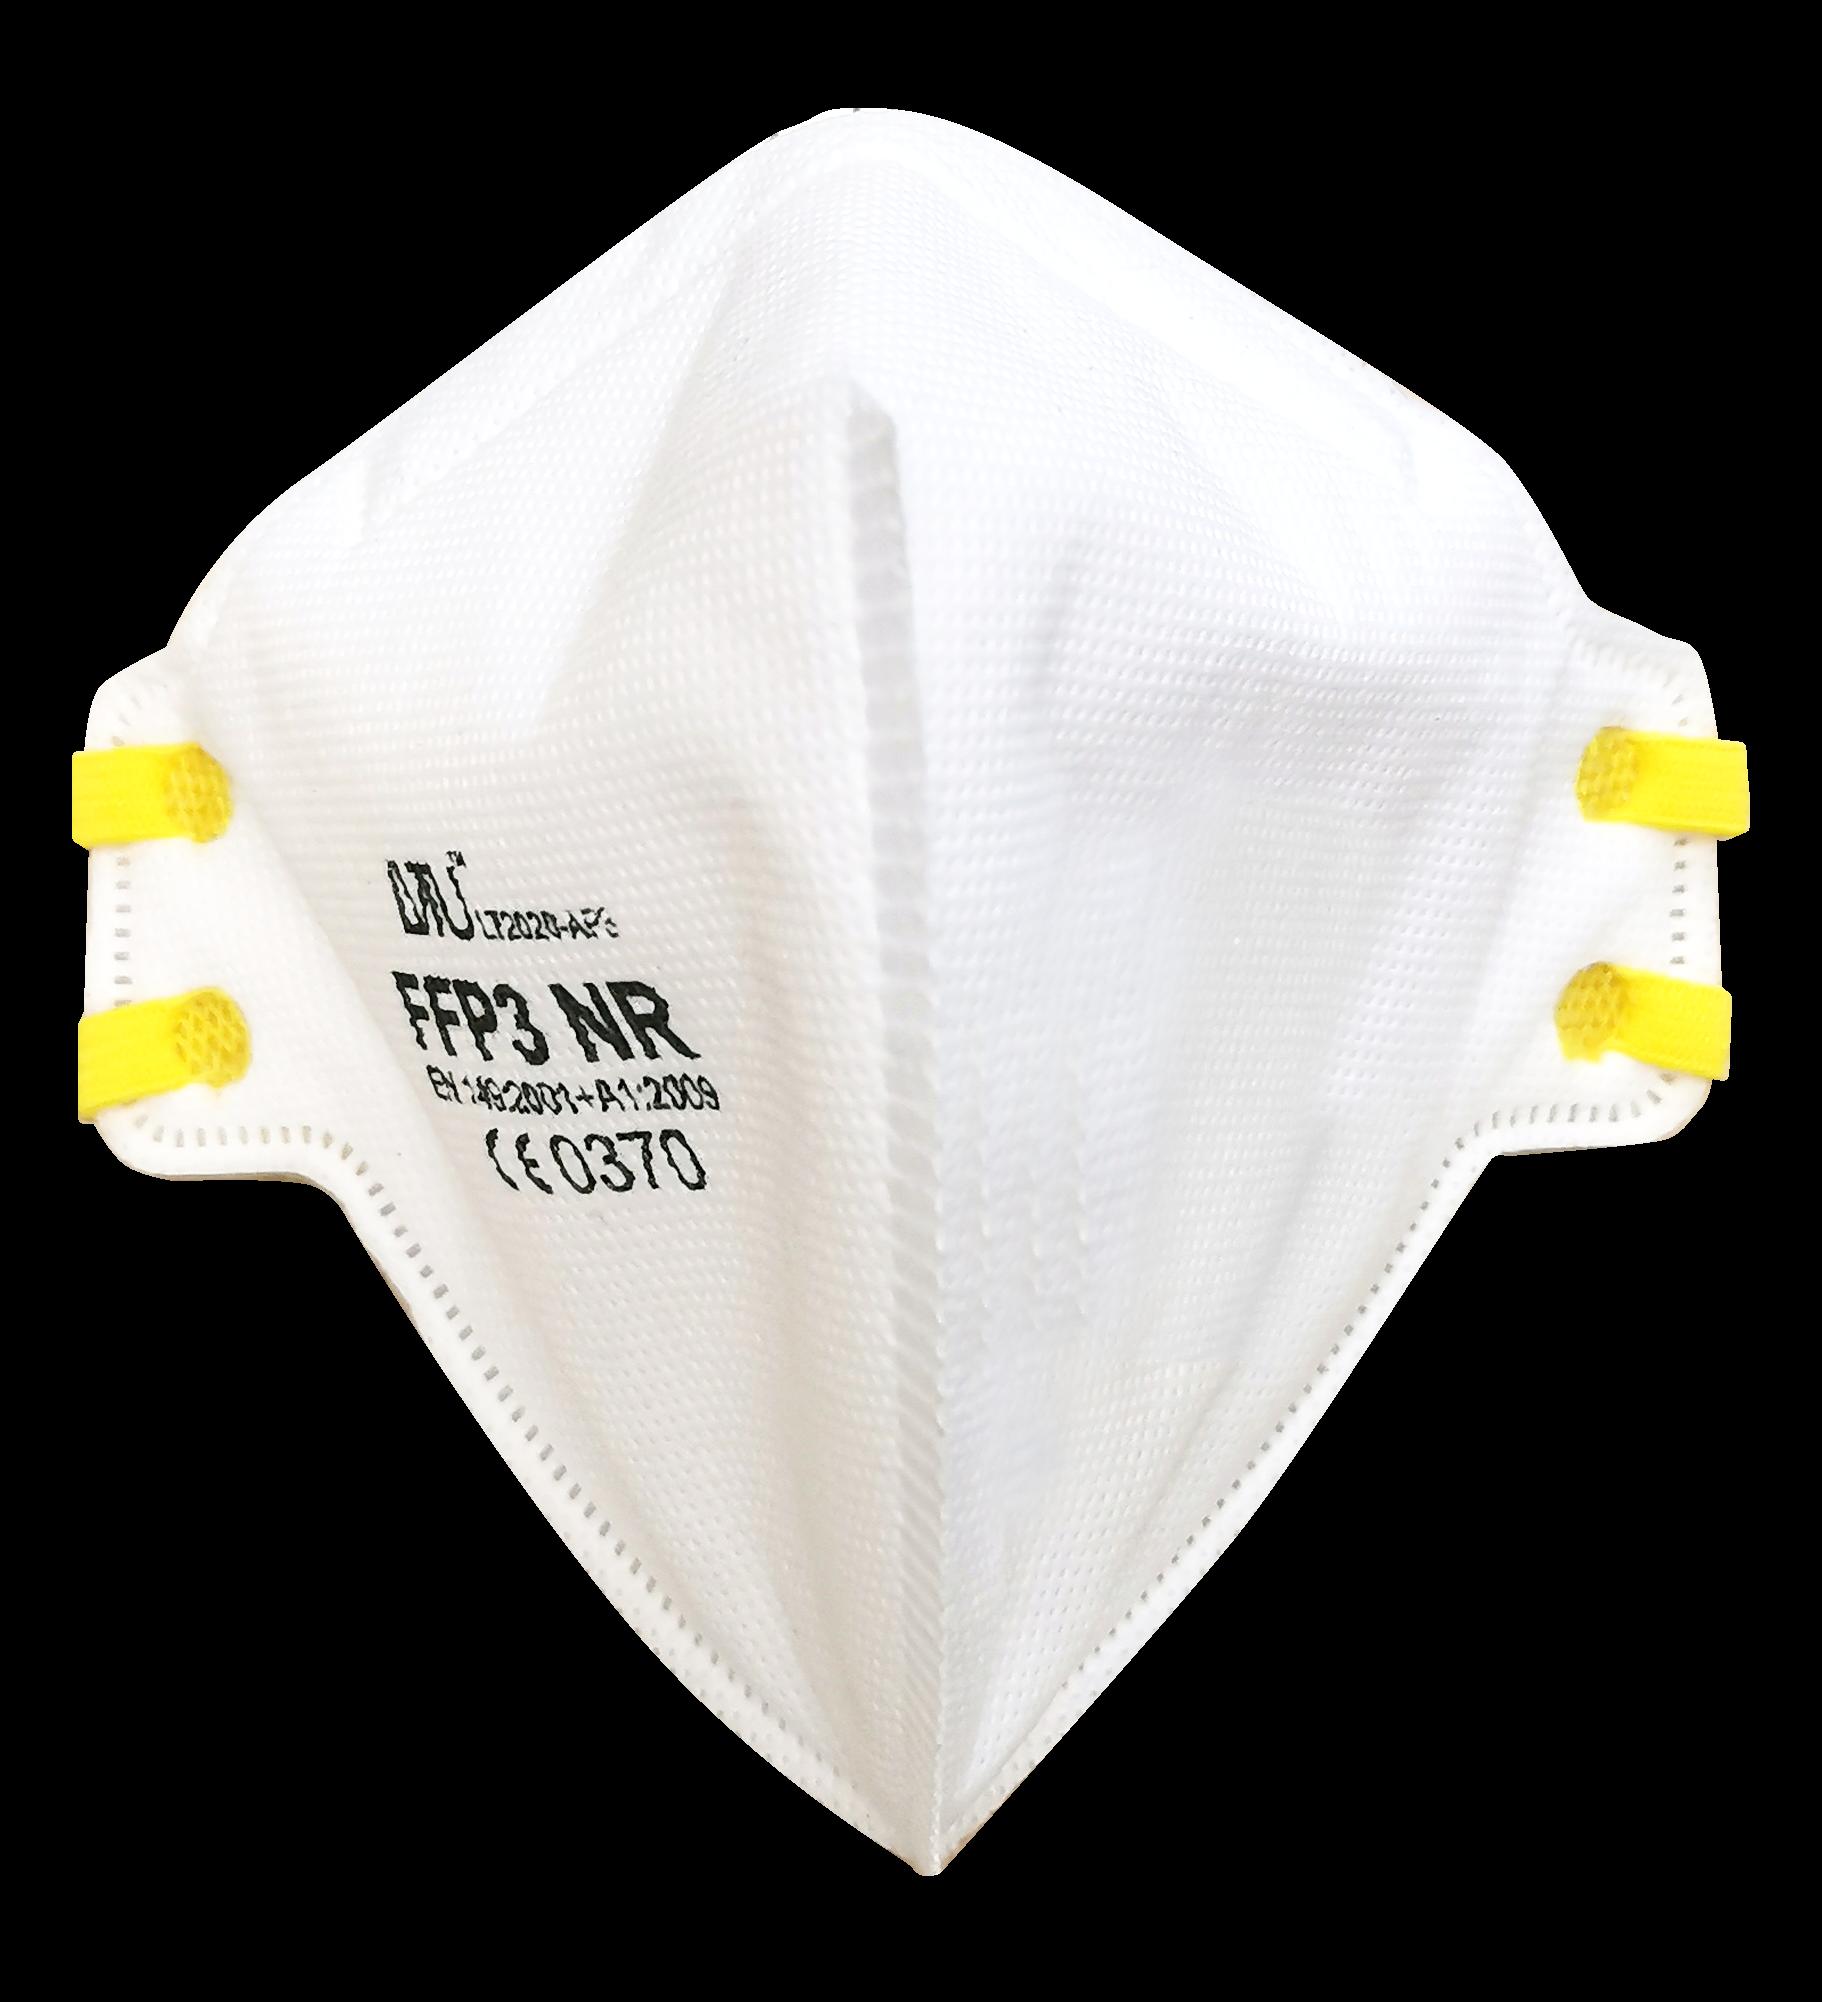 20x FFP3 Atemschutzmaske Schutzmaske Maske CE0370 EN149:2001+A1:200 Zertifizier